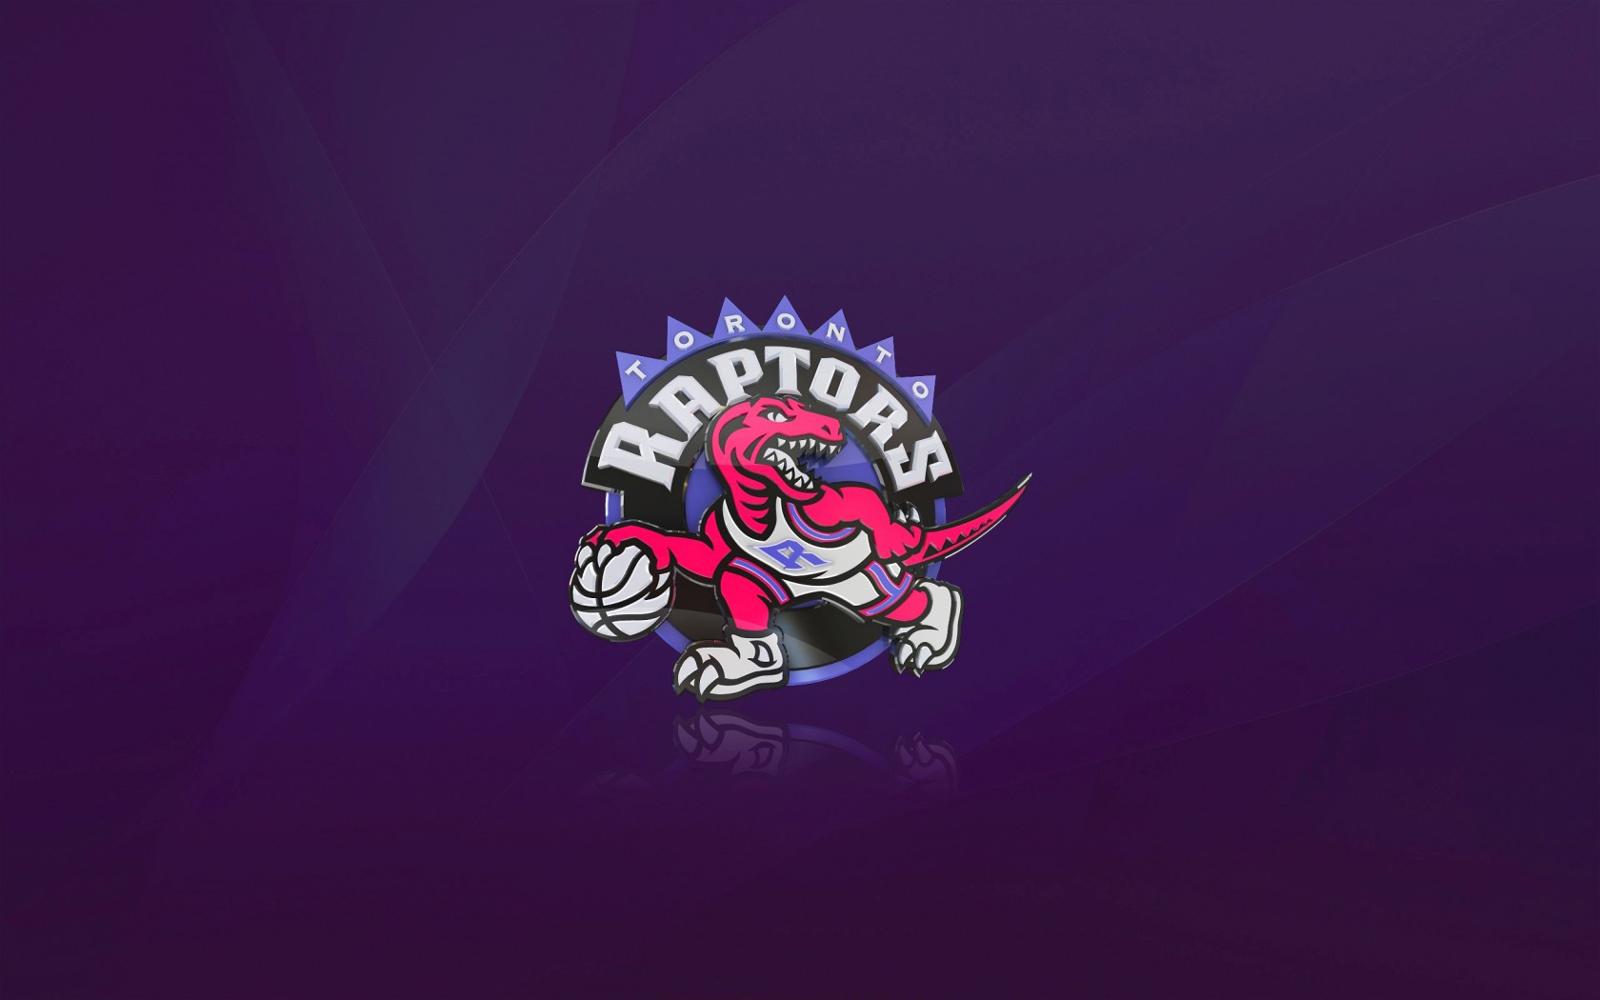 Toronto raptors 2013 logo nba united states of america hd - Toronto raptors logo wallpaper ...